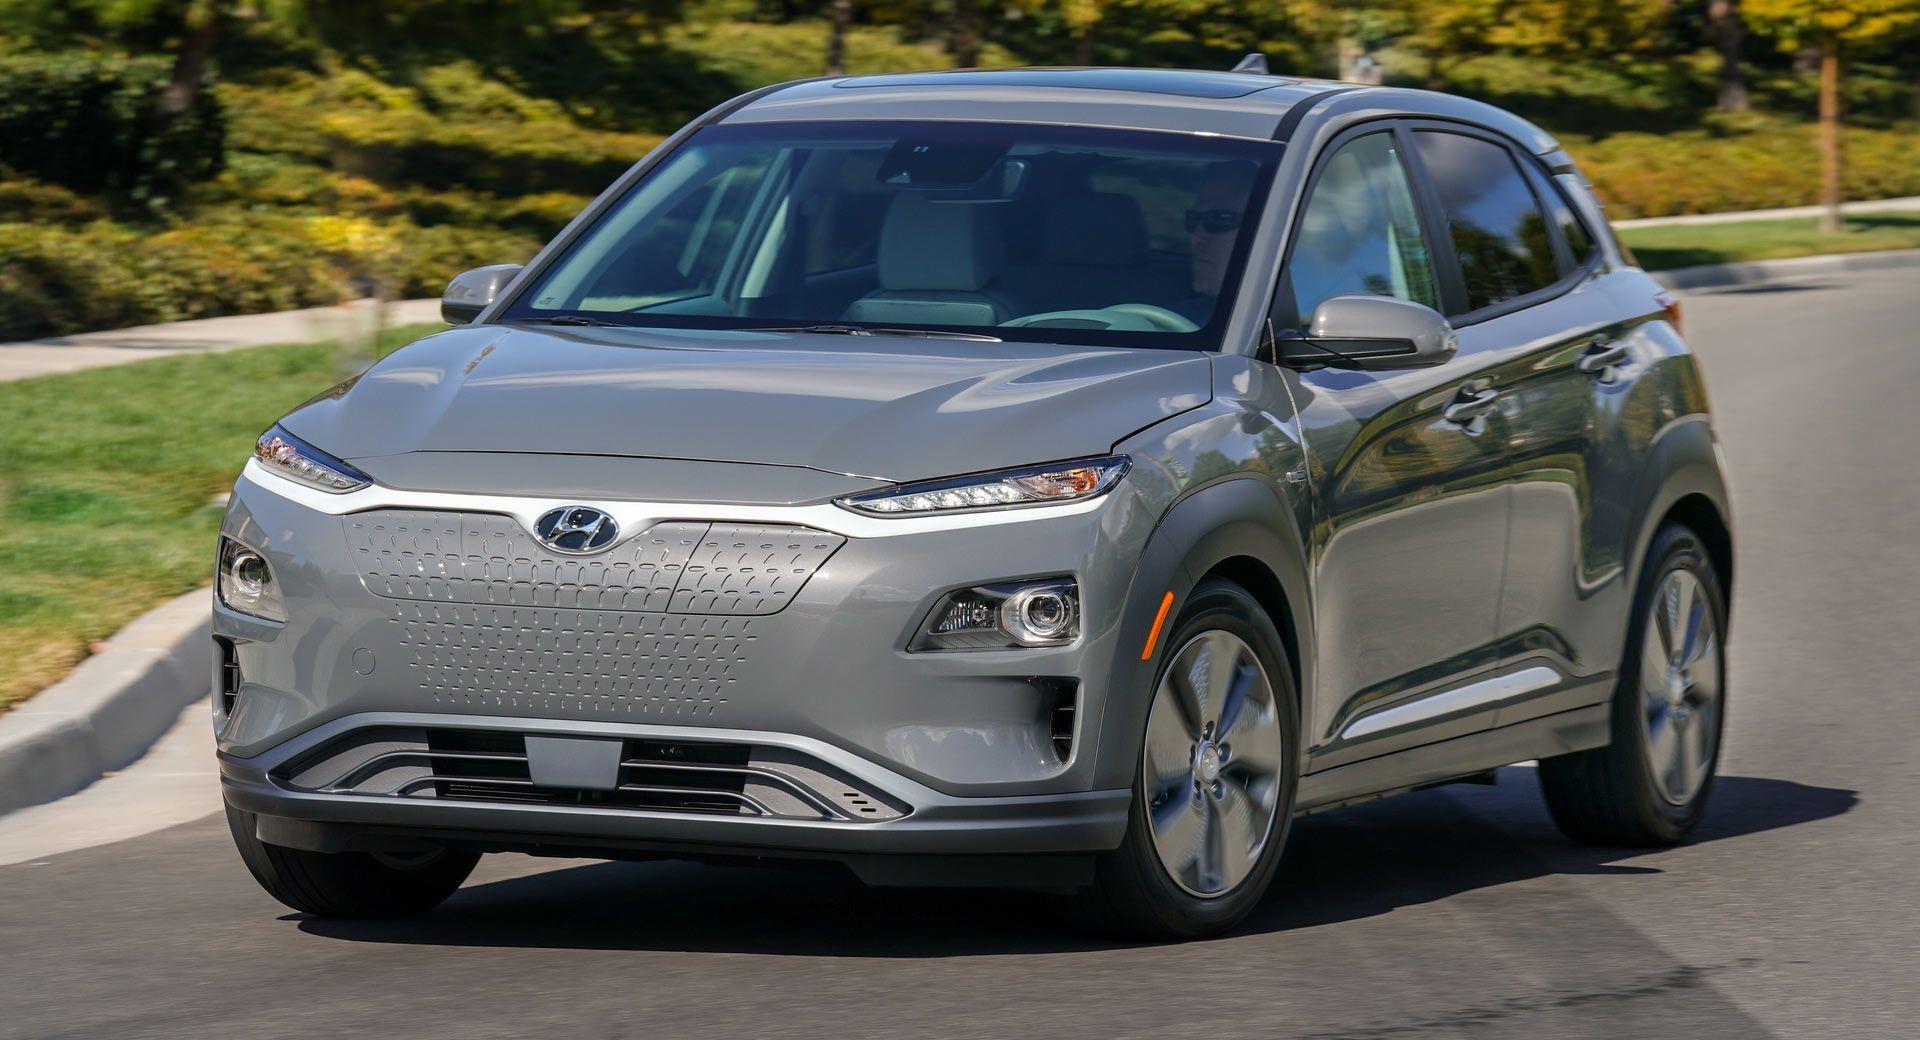 Us Spec Hyundai Kona Electric Promises An Impressive 250 Miles Of Ev Range Poster